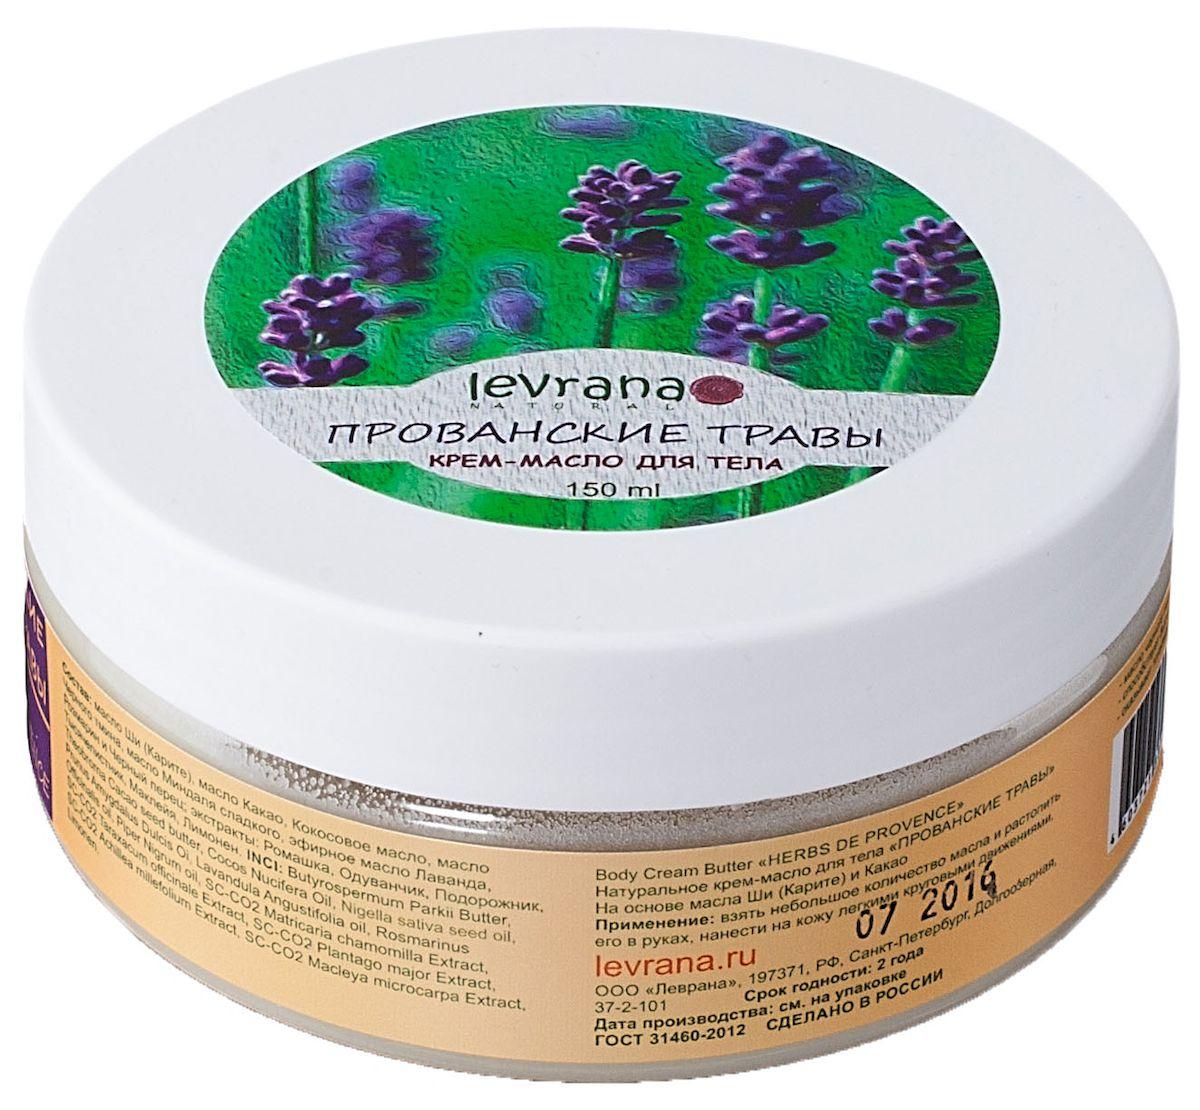 Levrana Крем-масло Прованские травы, 150 мл крем солнцезащитный levrana levrana le034lwvbu26